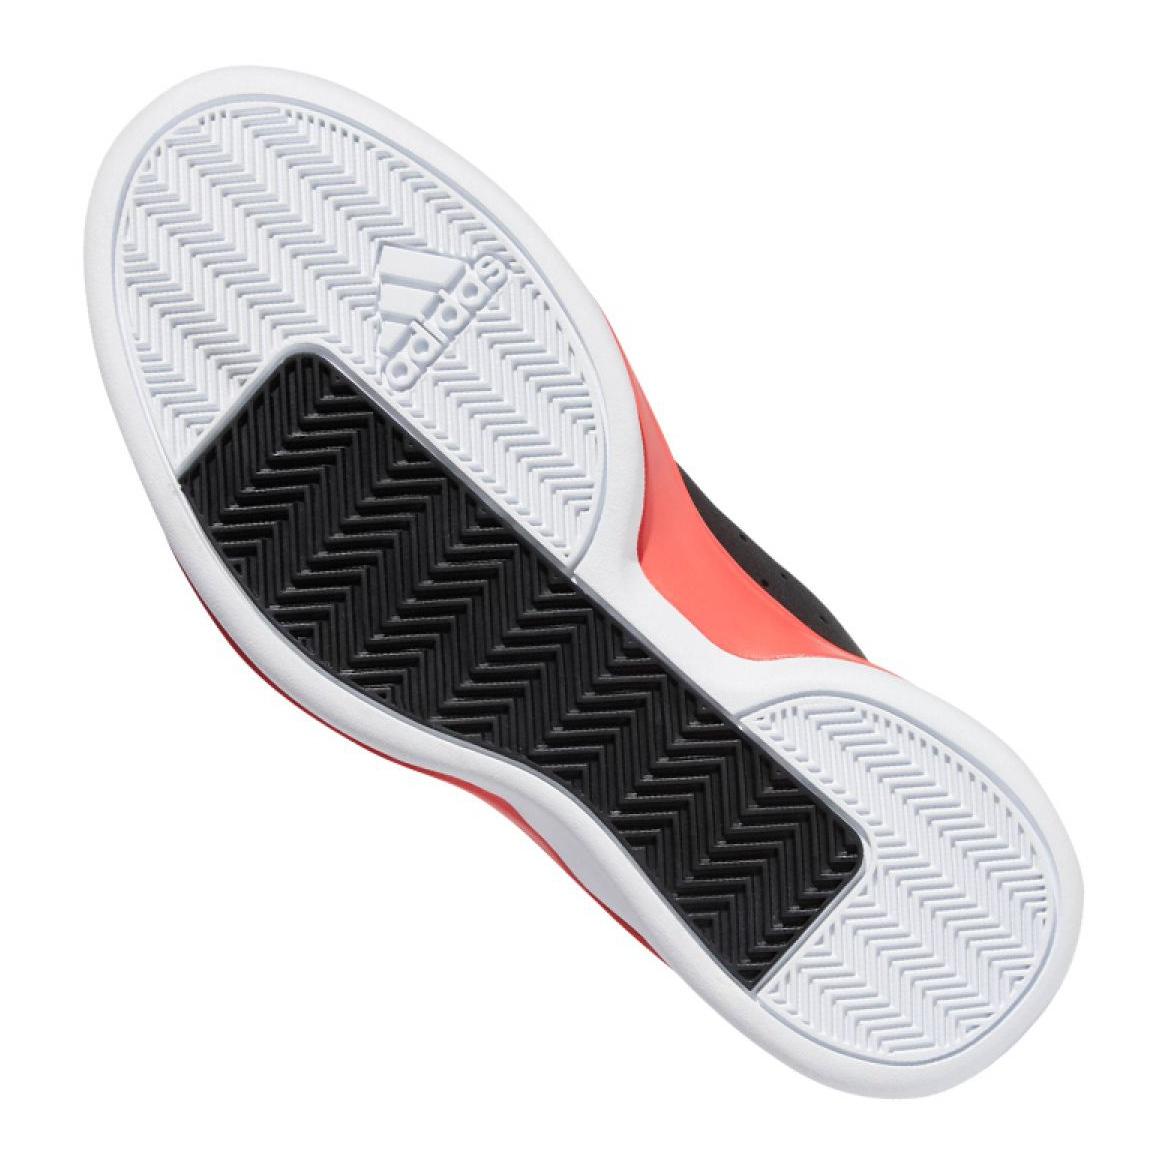 Chaussures M Basket Adversary Adidas De 2019 Bb9192 pl Pro